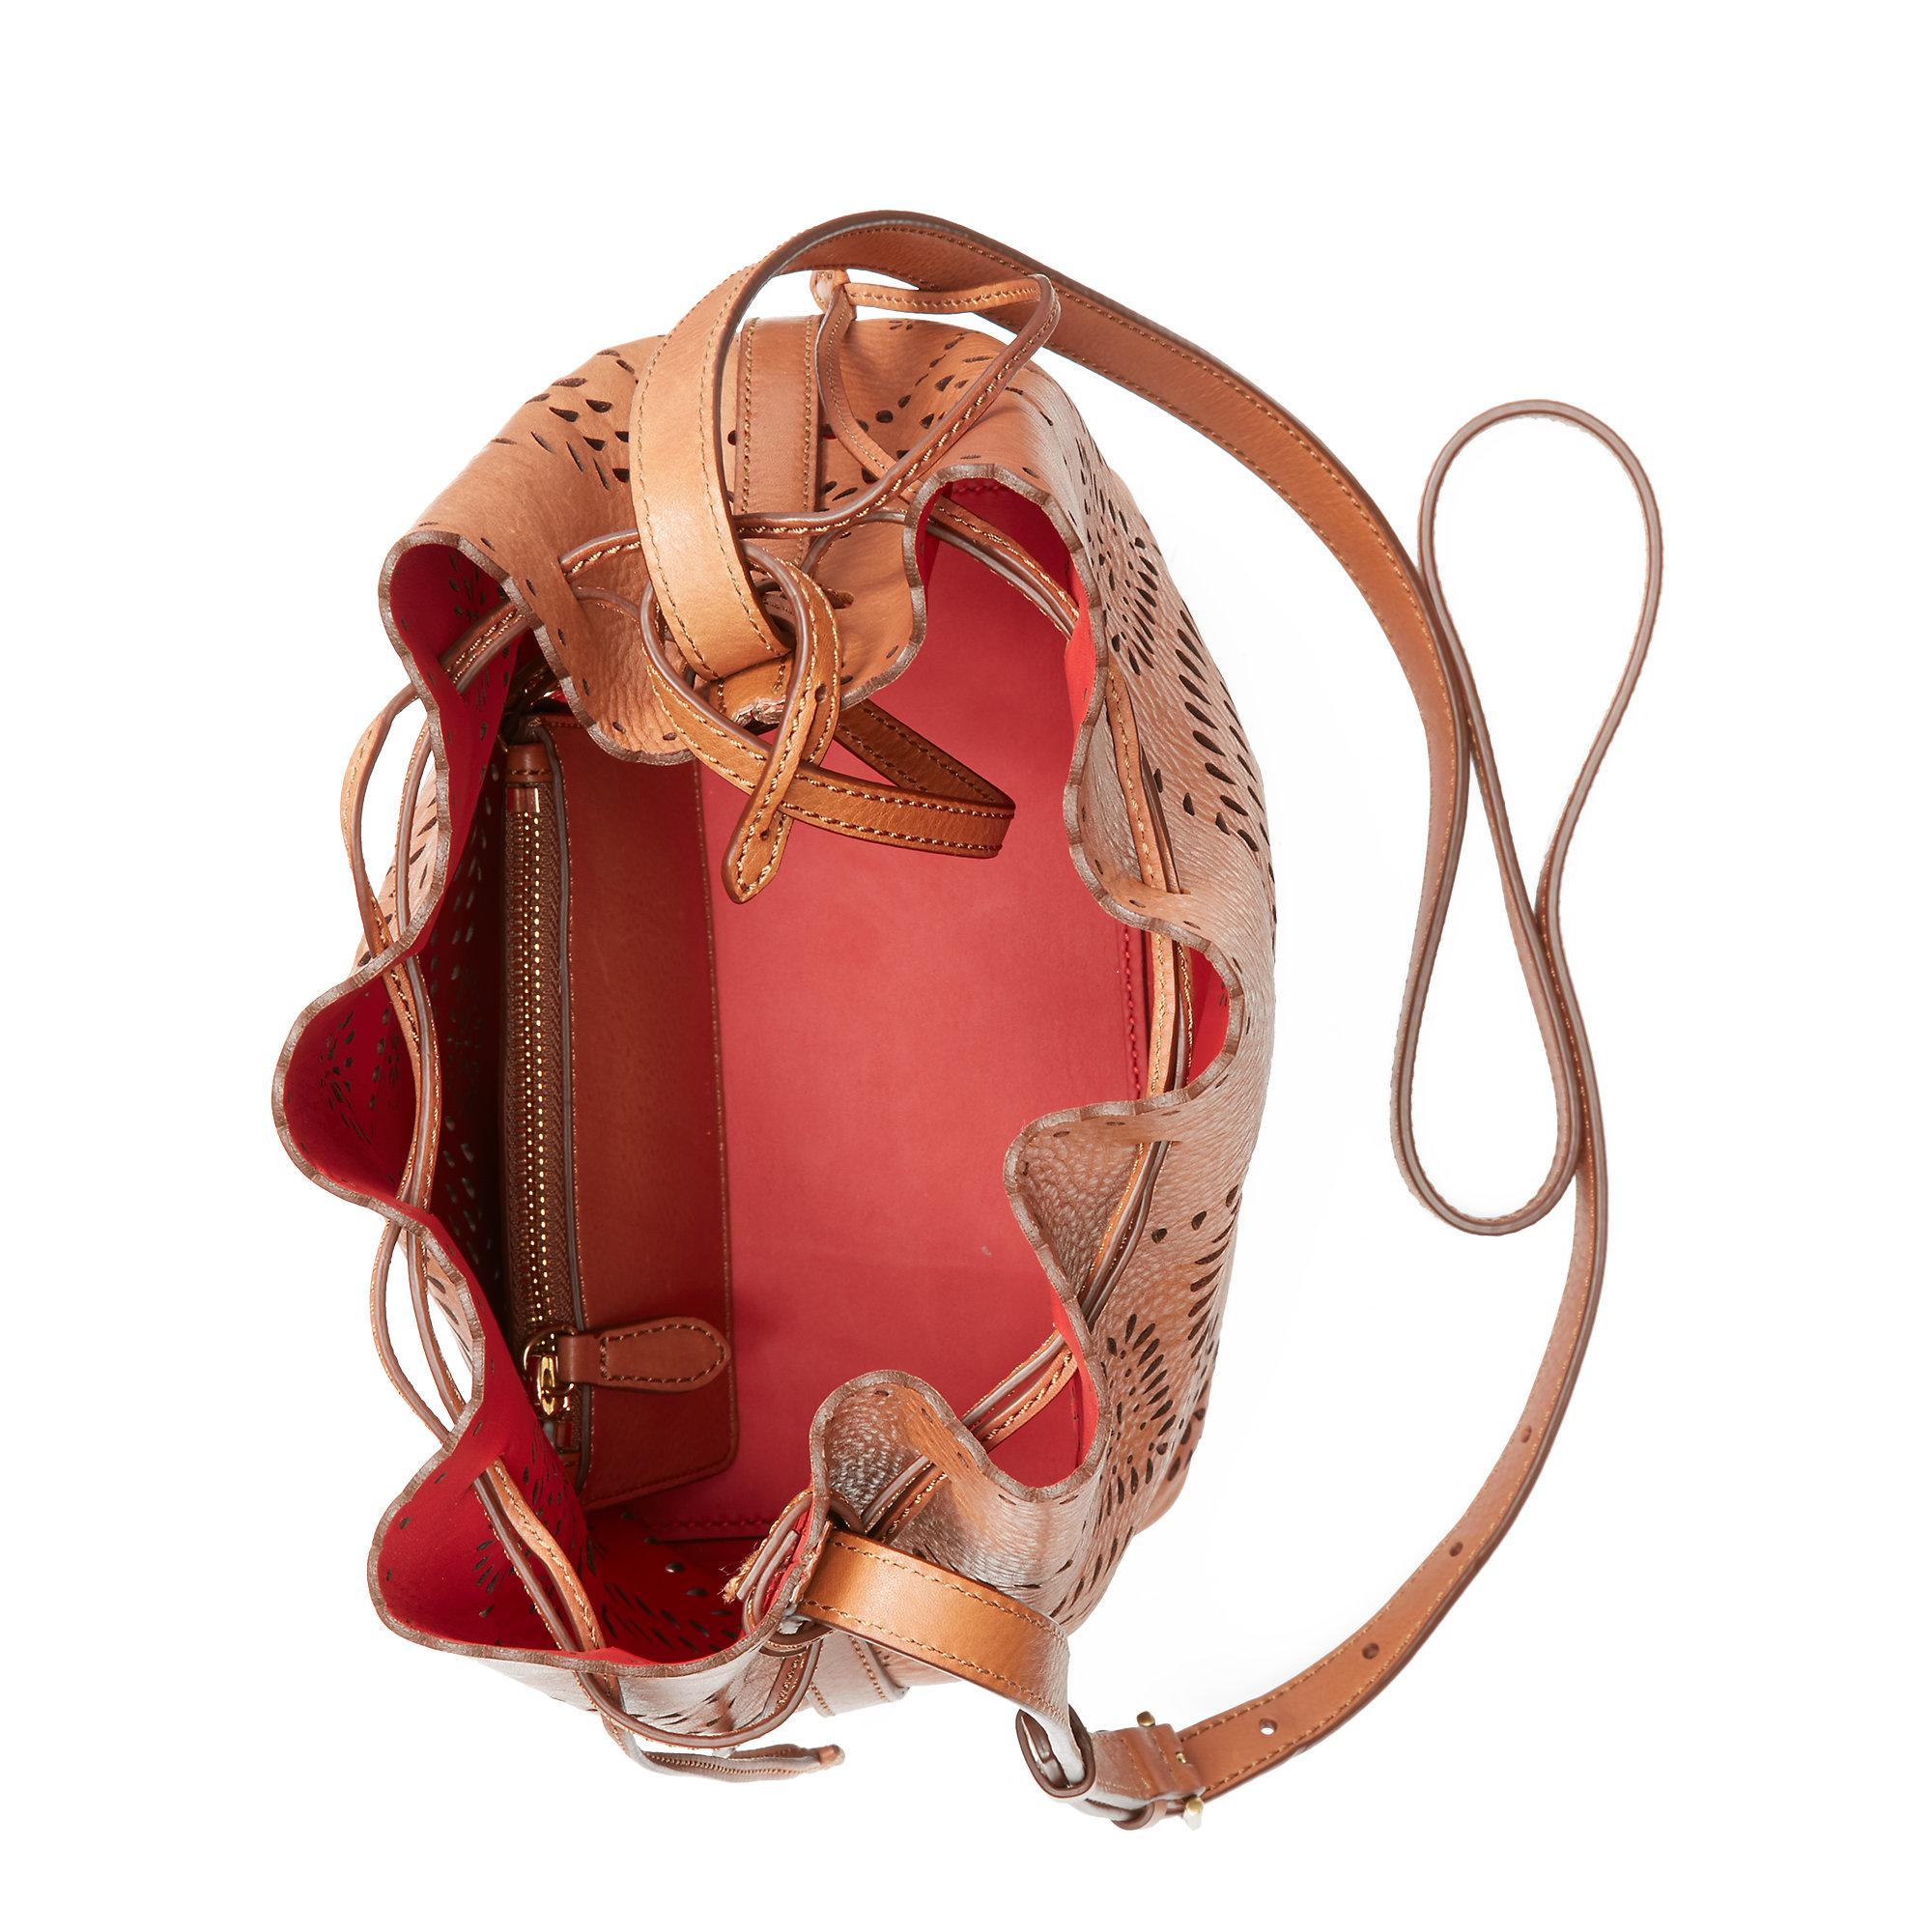 c59ac0739e Lyst - Polo Ralph Lauren Laser-cut Leather Bucket Bag